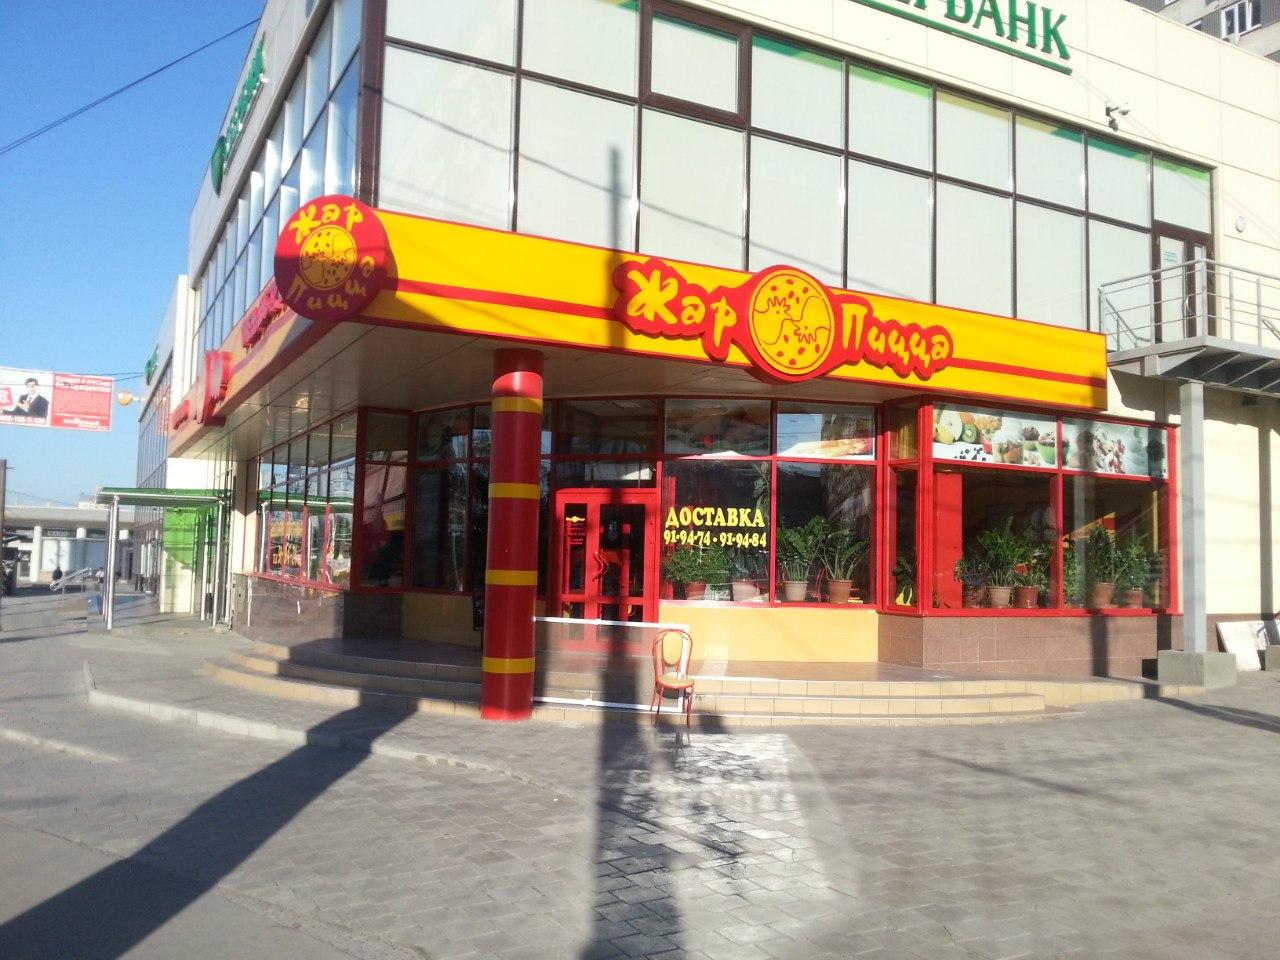 Жар-пицца, Волгоград - 18 отзывов о ресторане